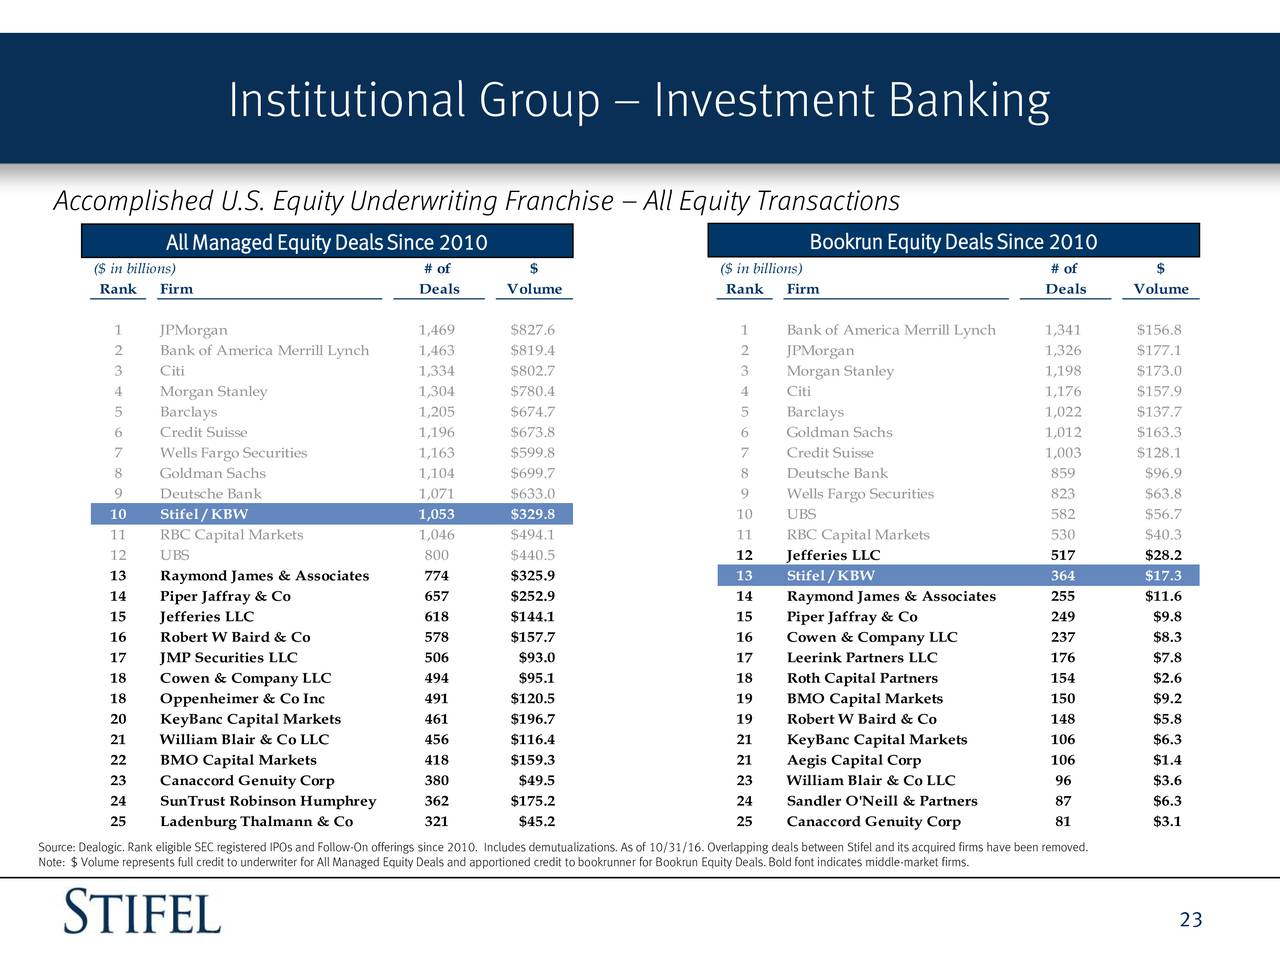 Stifel investment banking interview accounting focuri de primavera metaforex